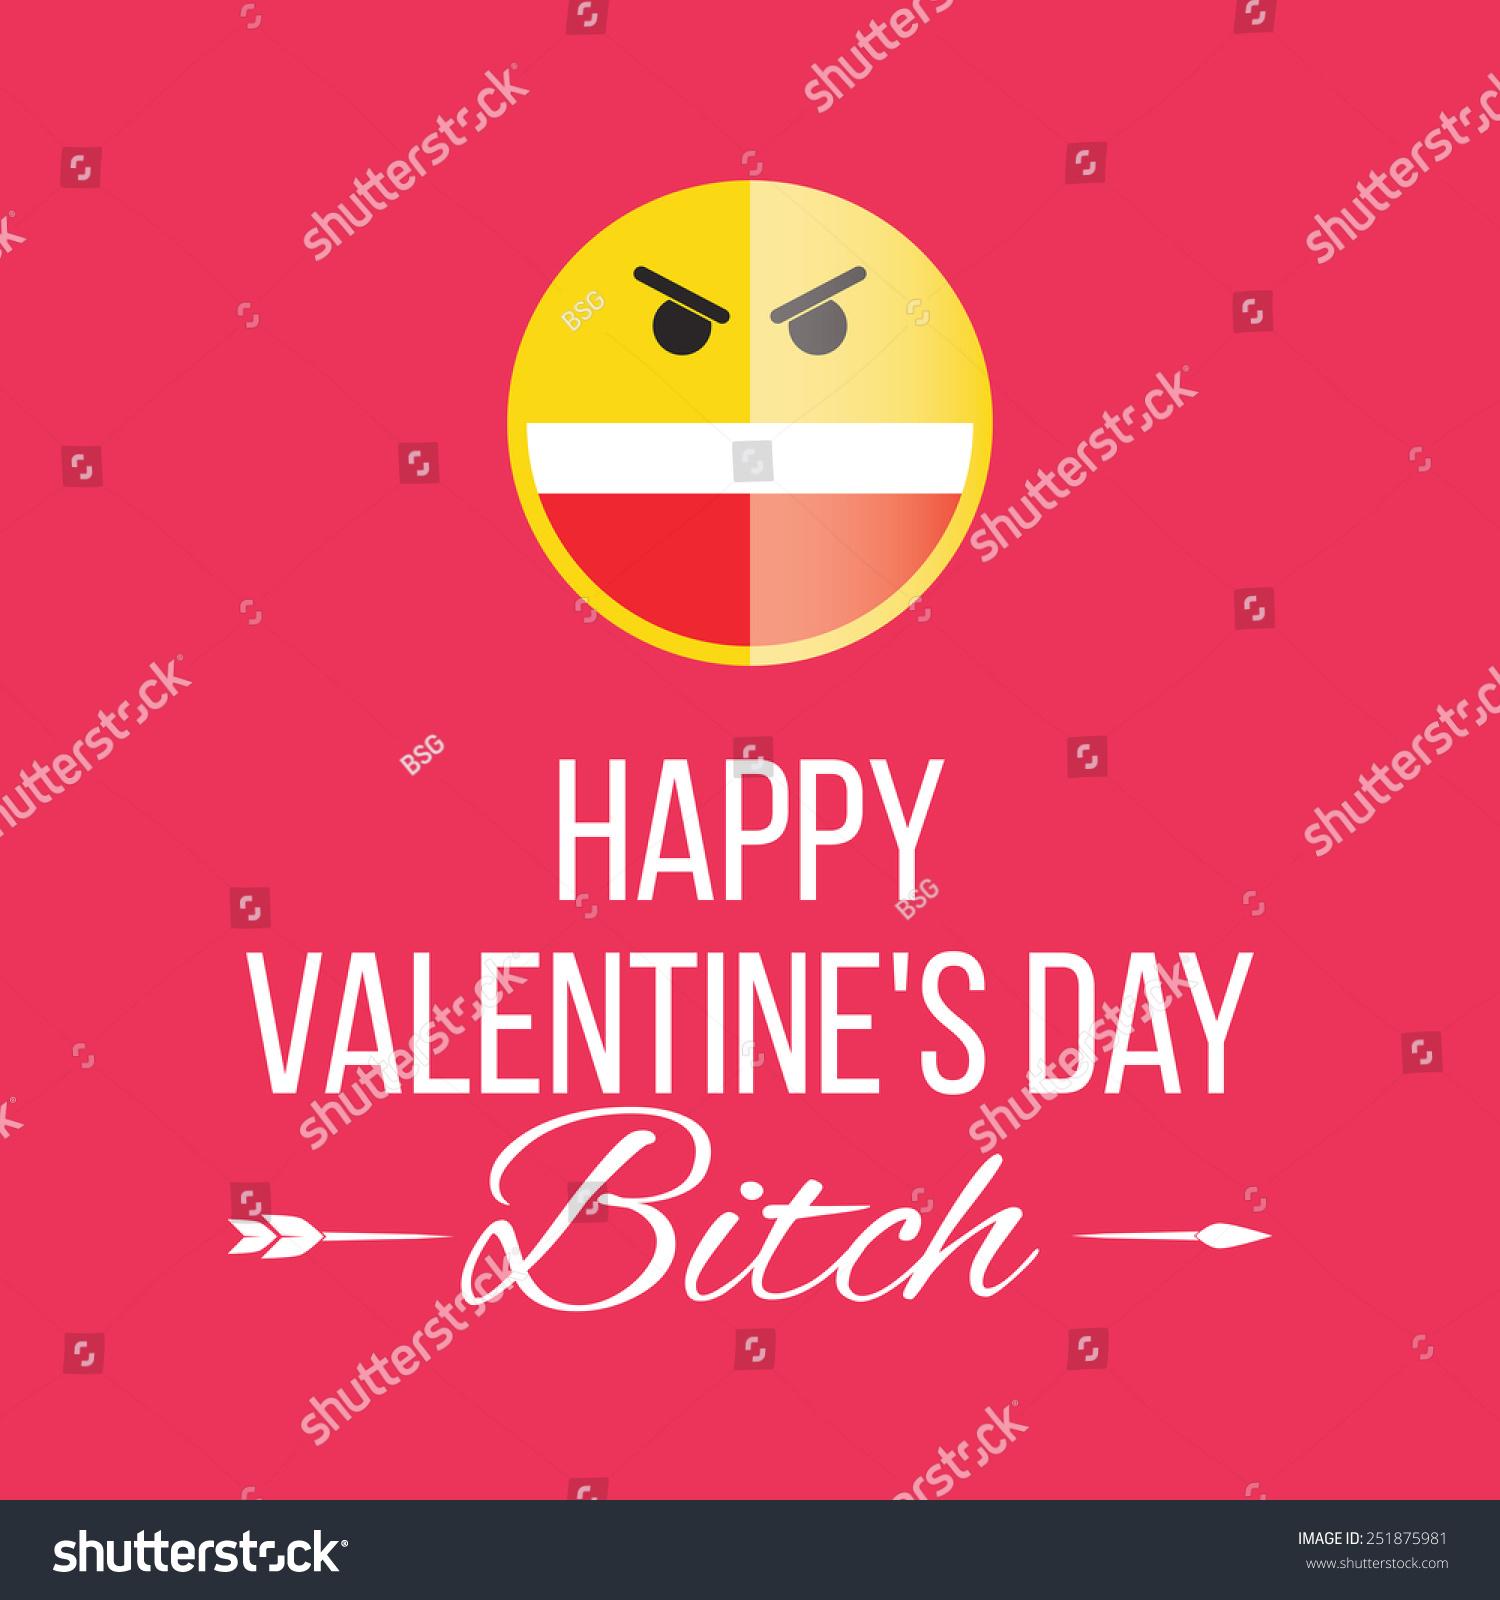 smile happy valentines day a former bitch funny joke on a red background - Valentines Joke